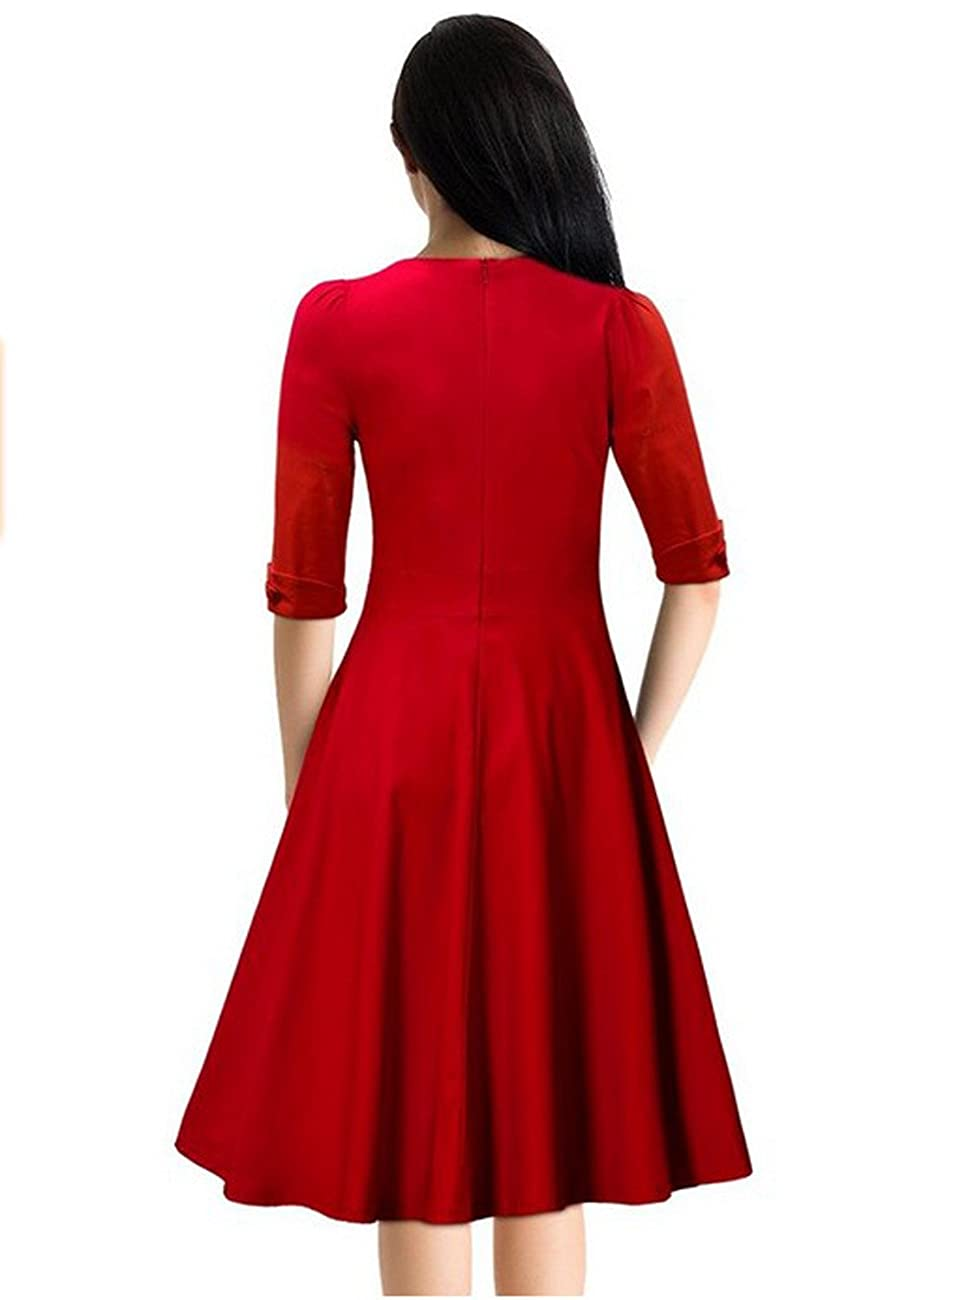 SYLVIEY Women's Hepburn Style Short Sleeve Vintage Bridesmaid Party Dress 1